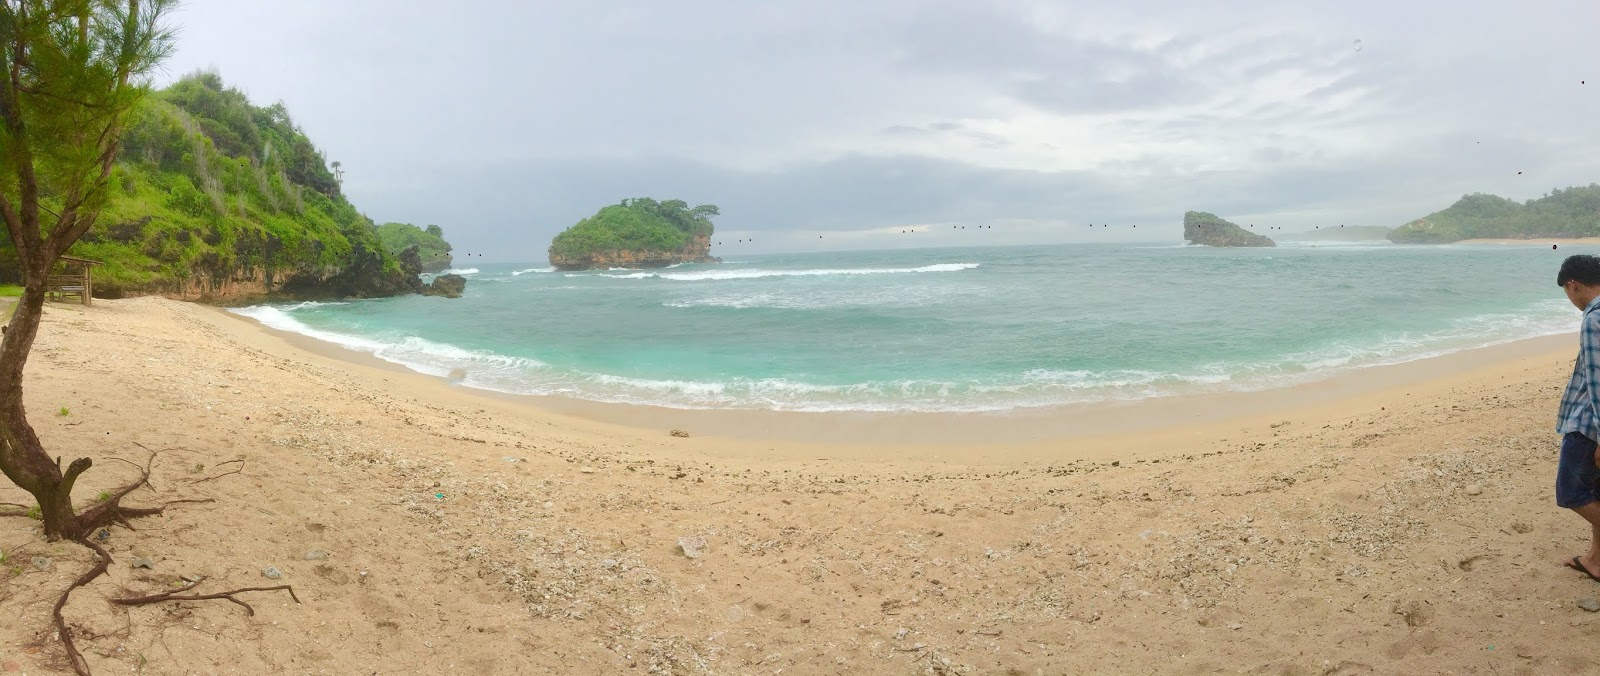 Pantai Watu Karung Beach Pacitan Indonesia